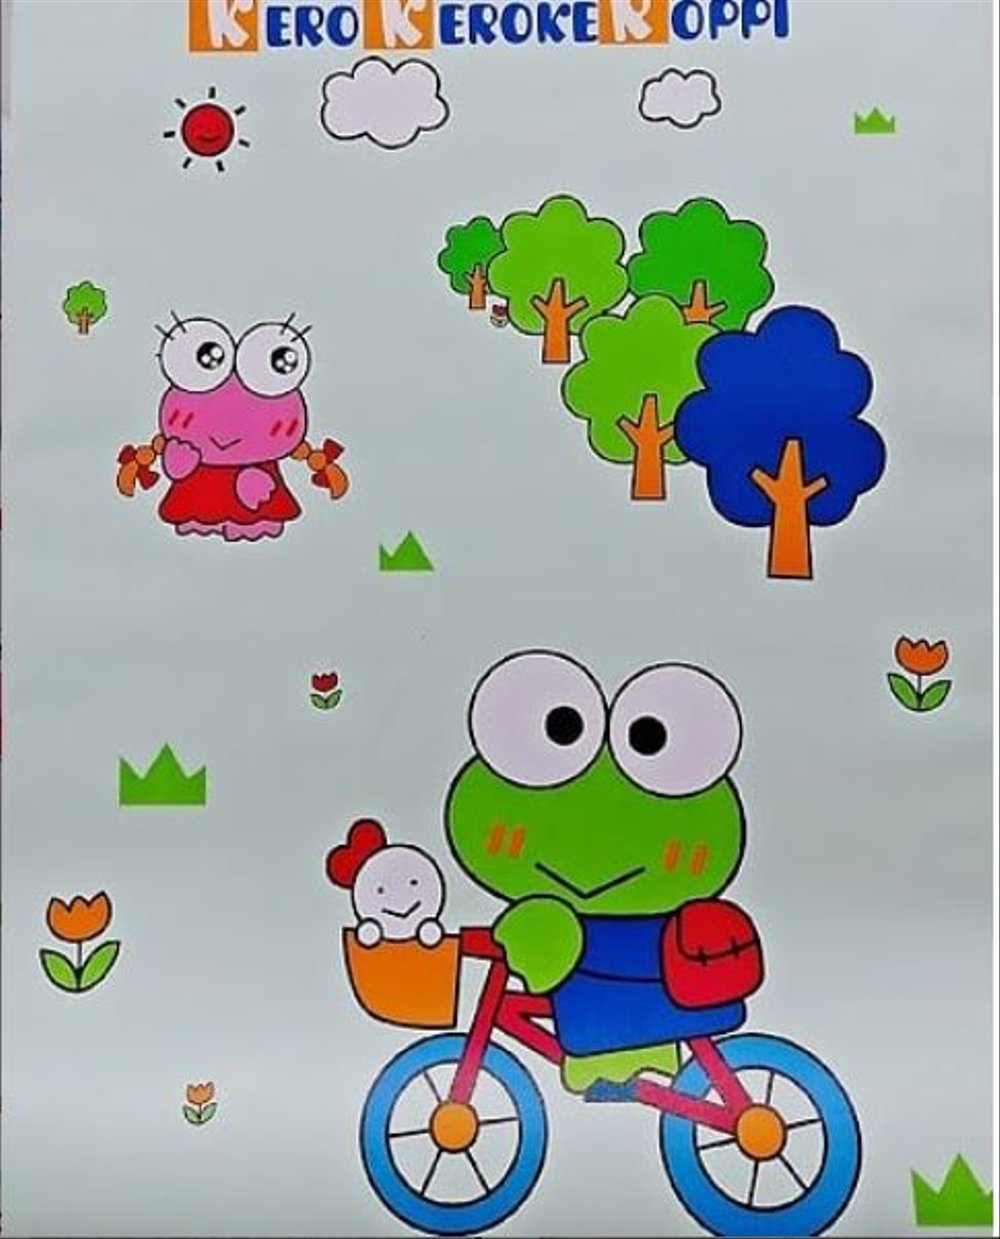 Wallpaper Sticker Keroppi Hijau - Kartun Wallpaper Lucu - HD Wallpaper